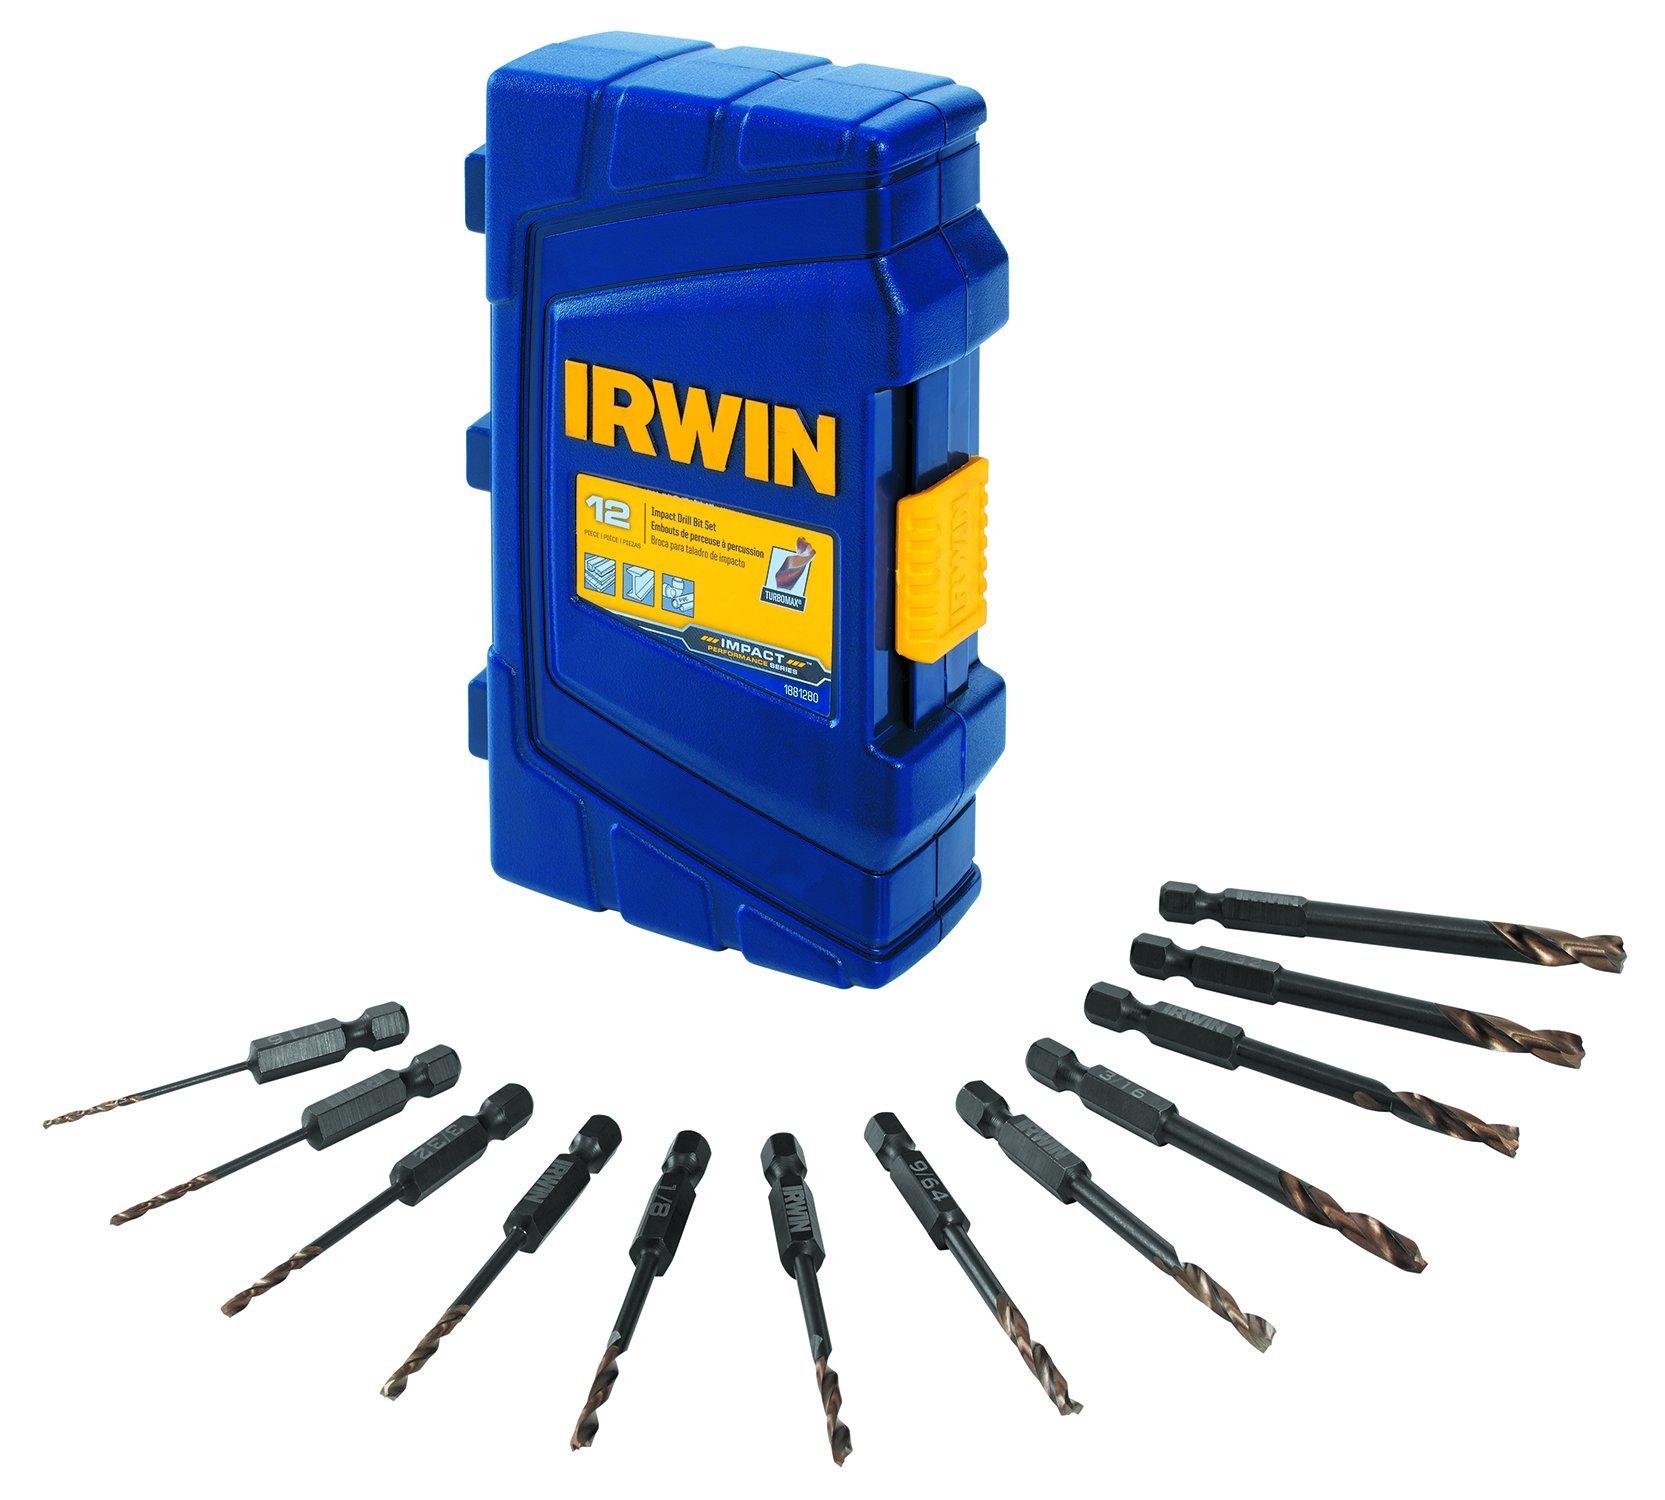 IRWIN Tools 1881280 Impact Performance Series Turbomax Drill Bit Set, Black and Gold, 12-Piece